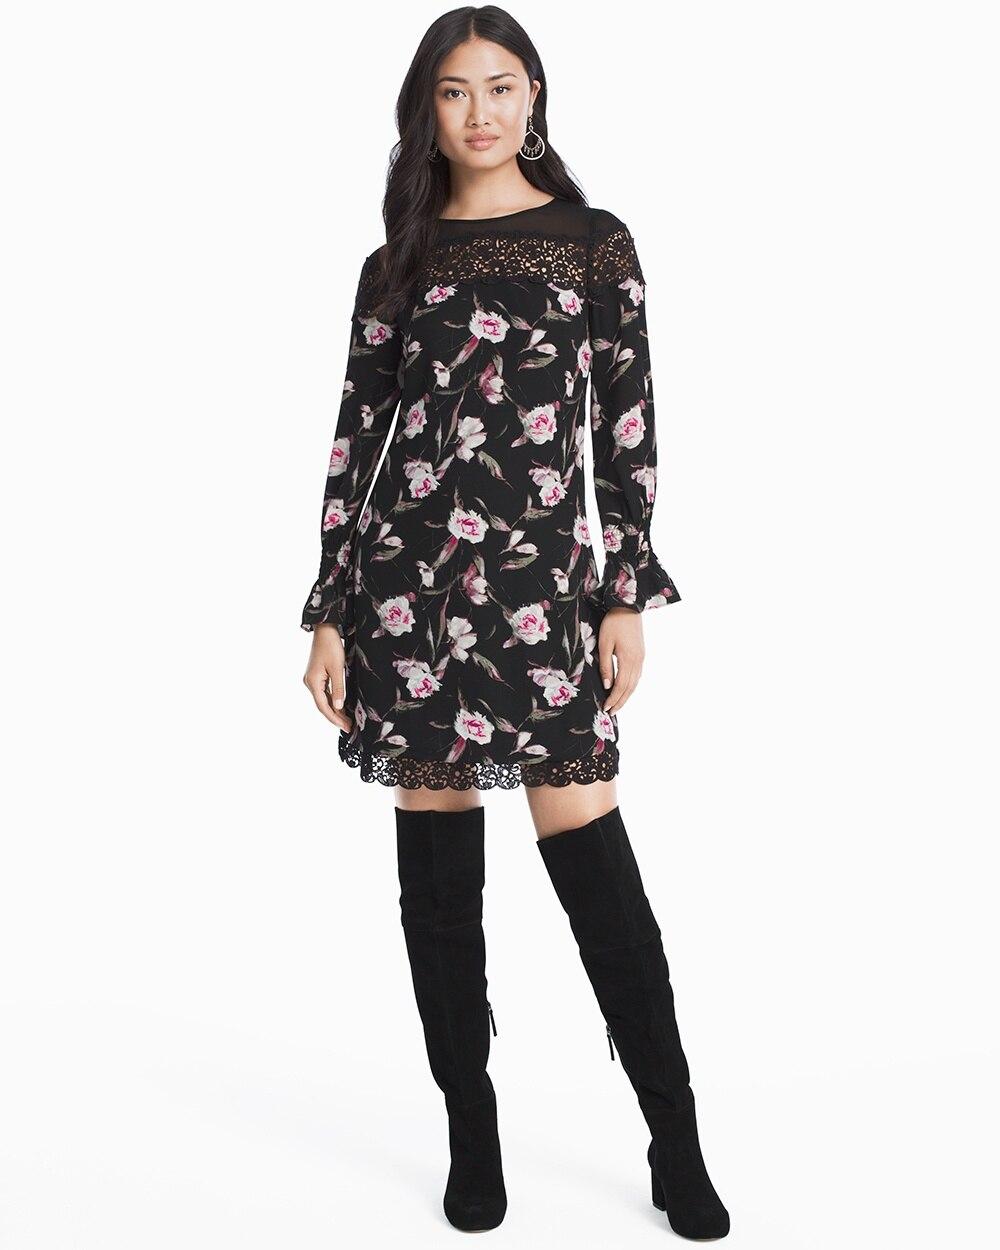 Long Sleeve Floral Lace Shift Dress White House Black Market